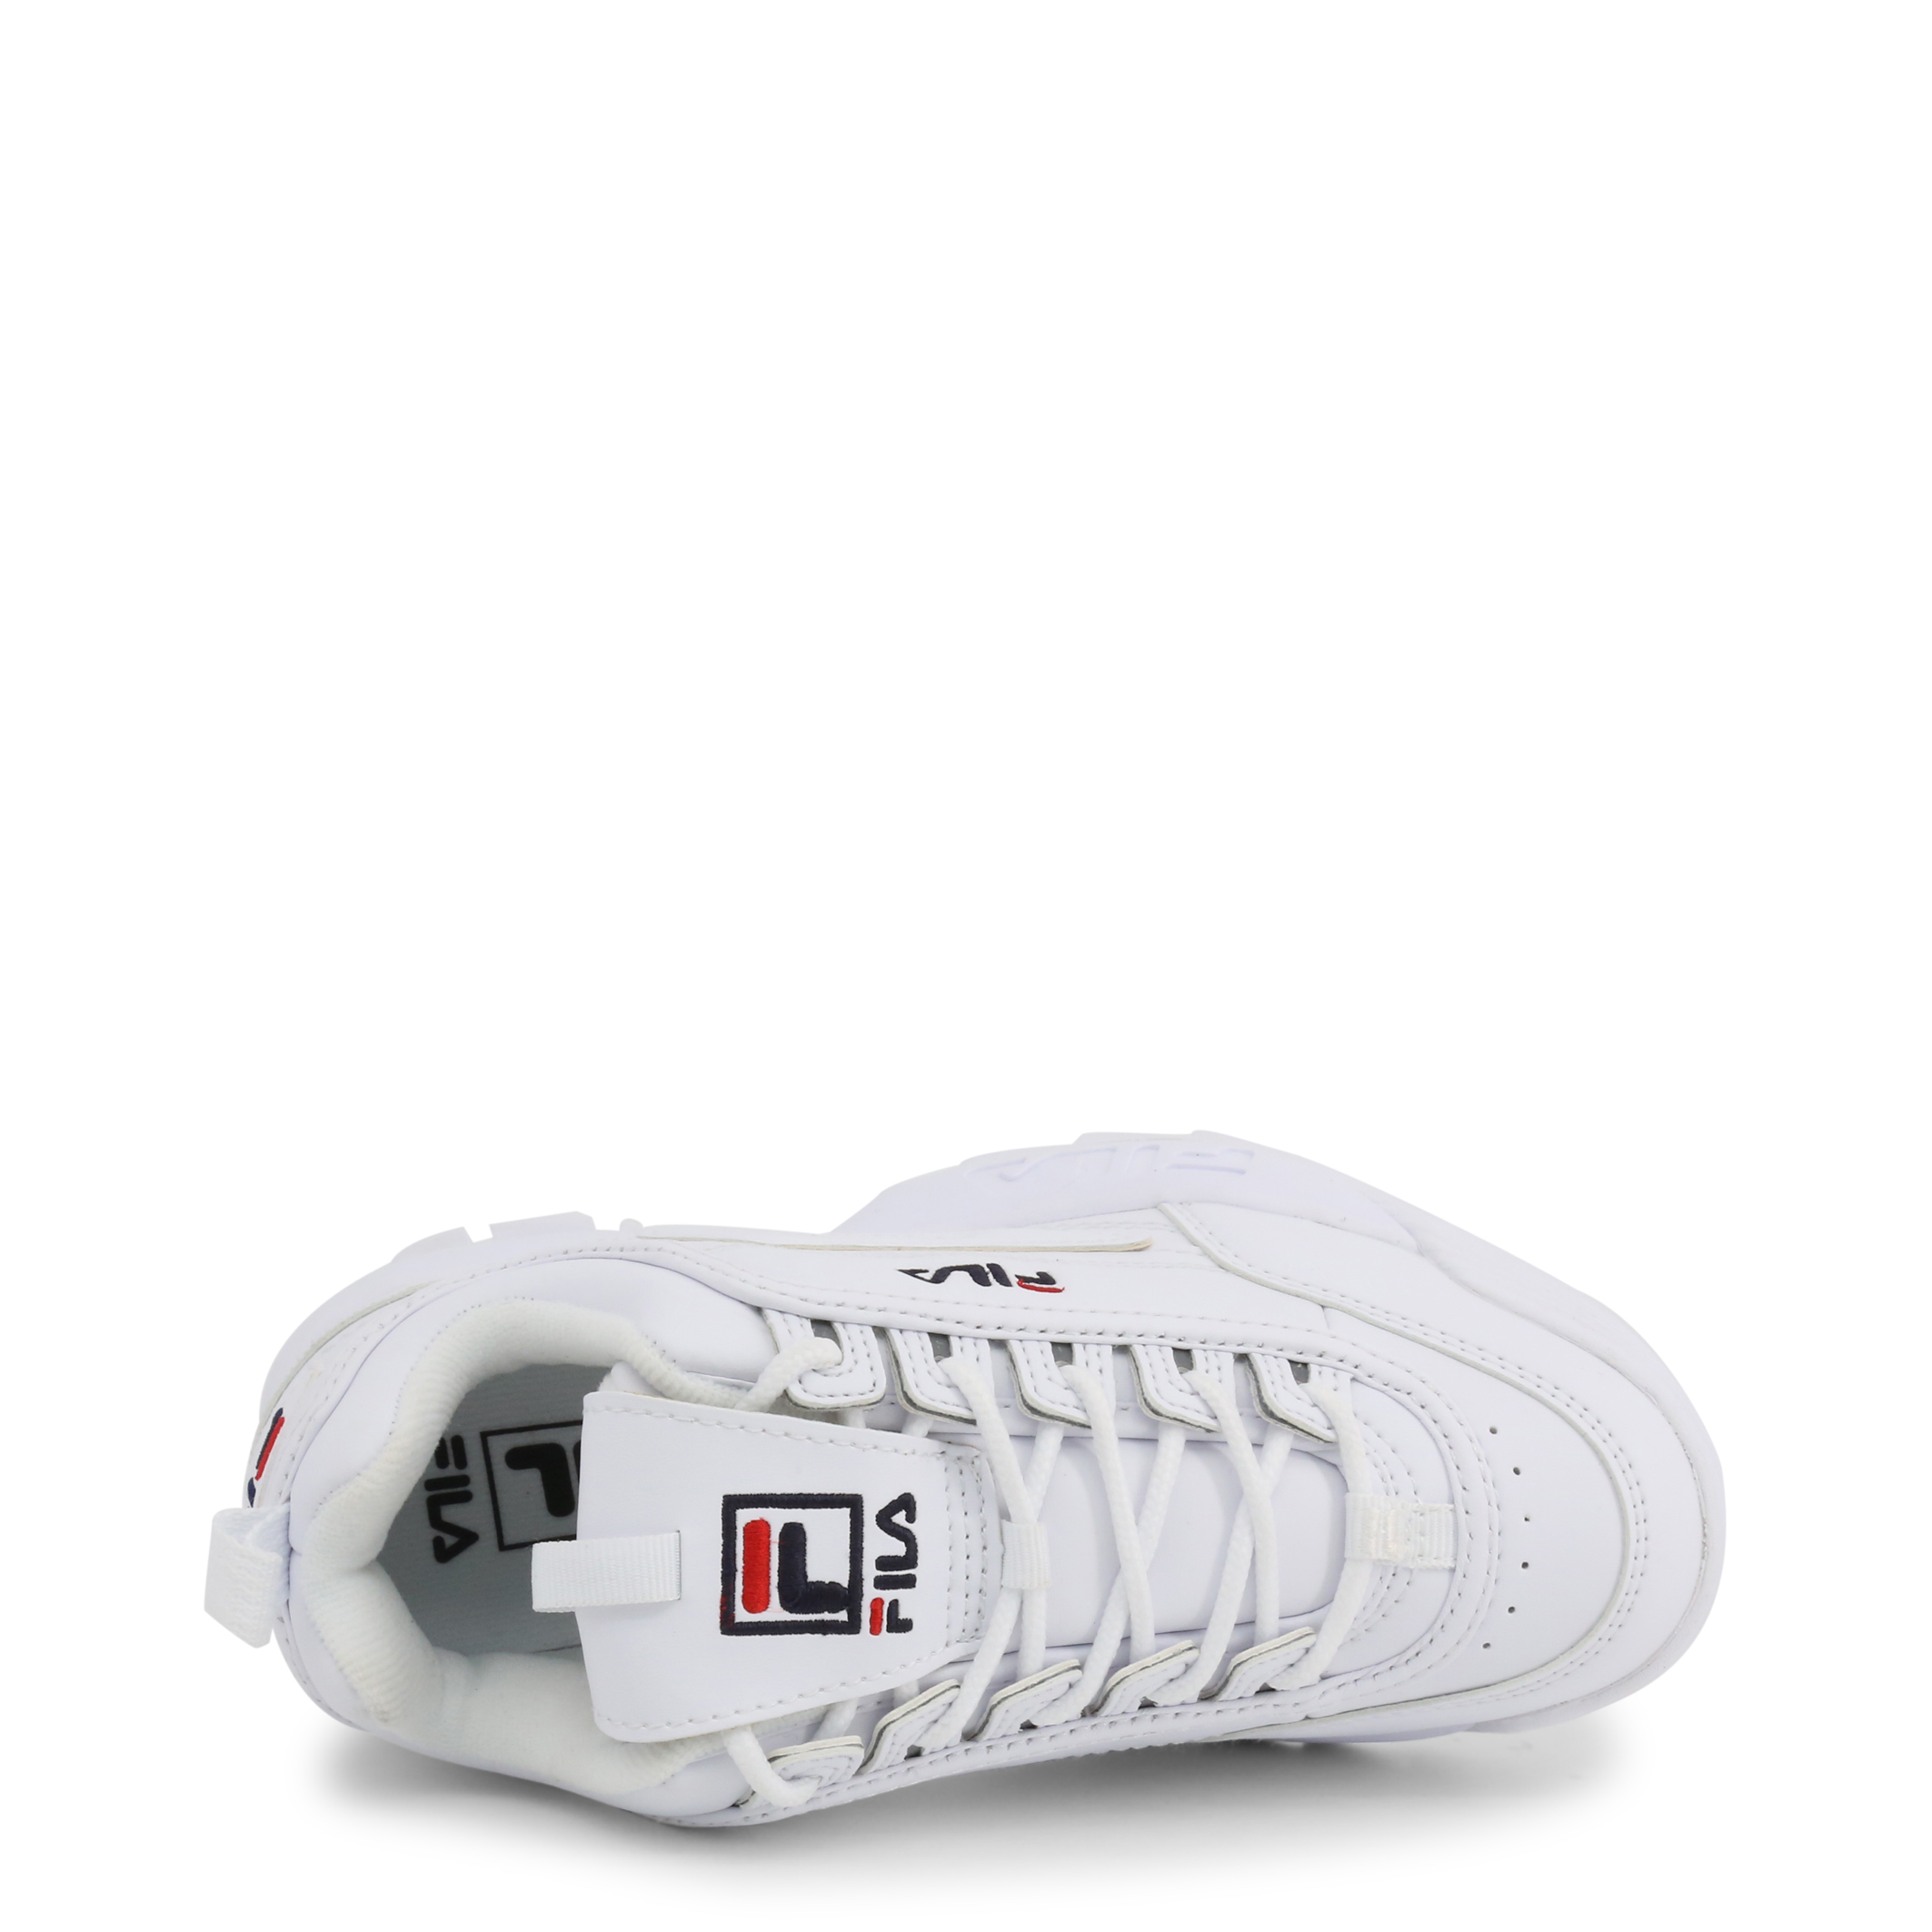 Baskets / Sneakers  Fila DISRUPTOR-LOW_1010302 white